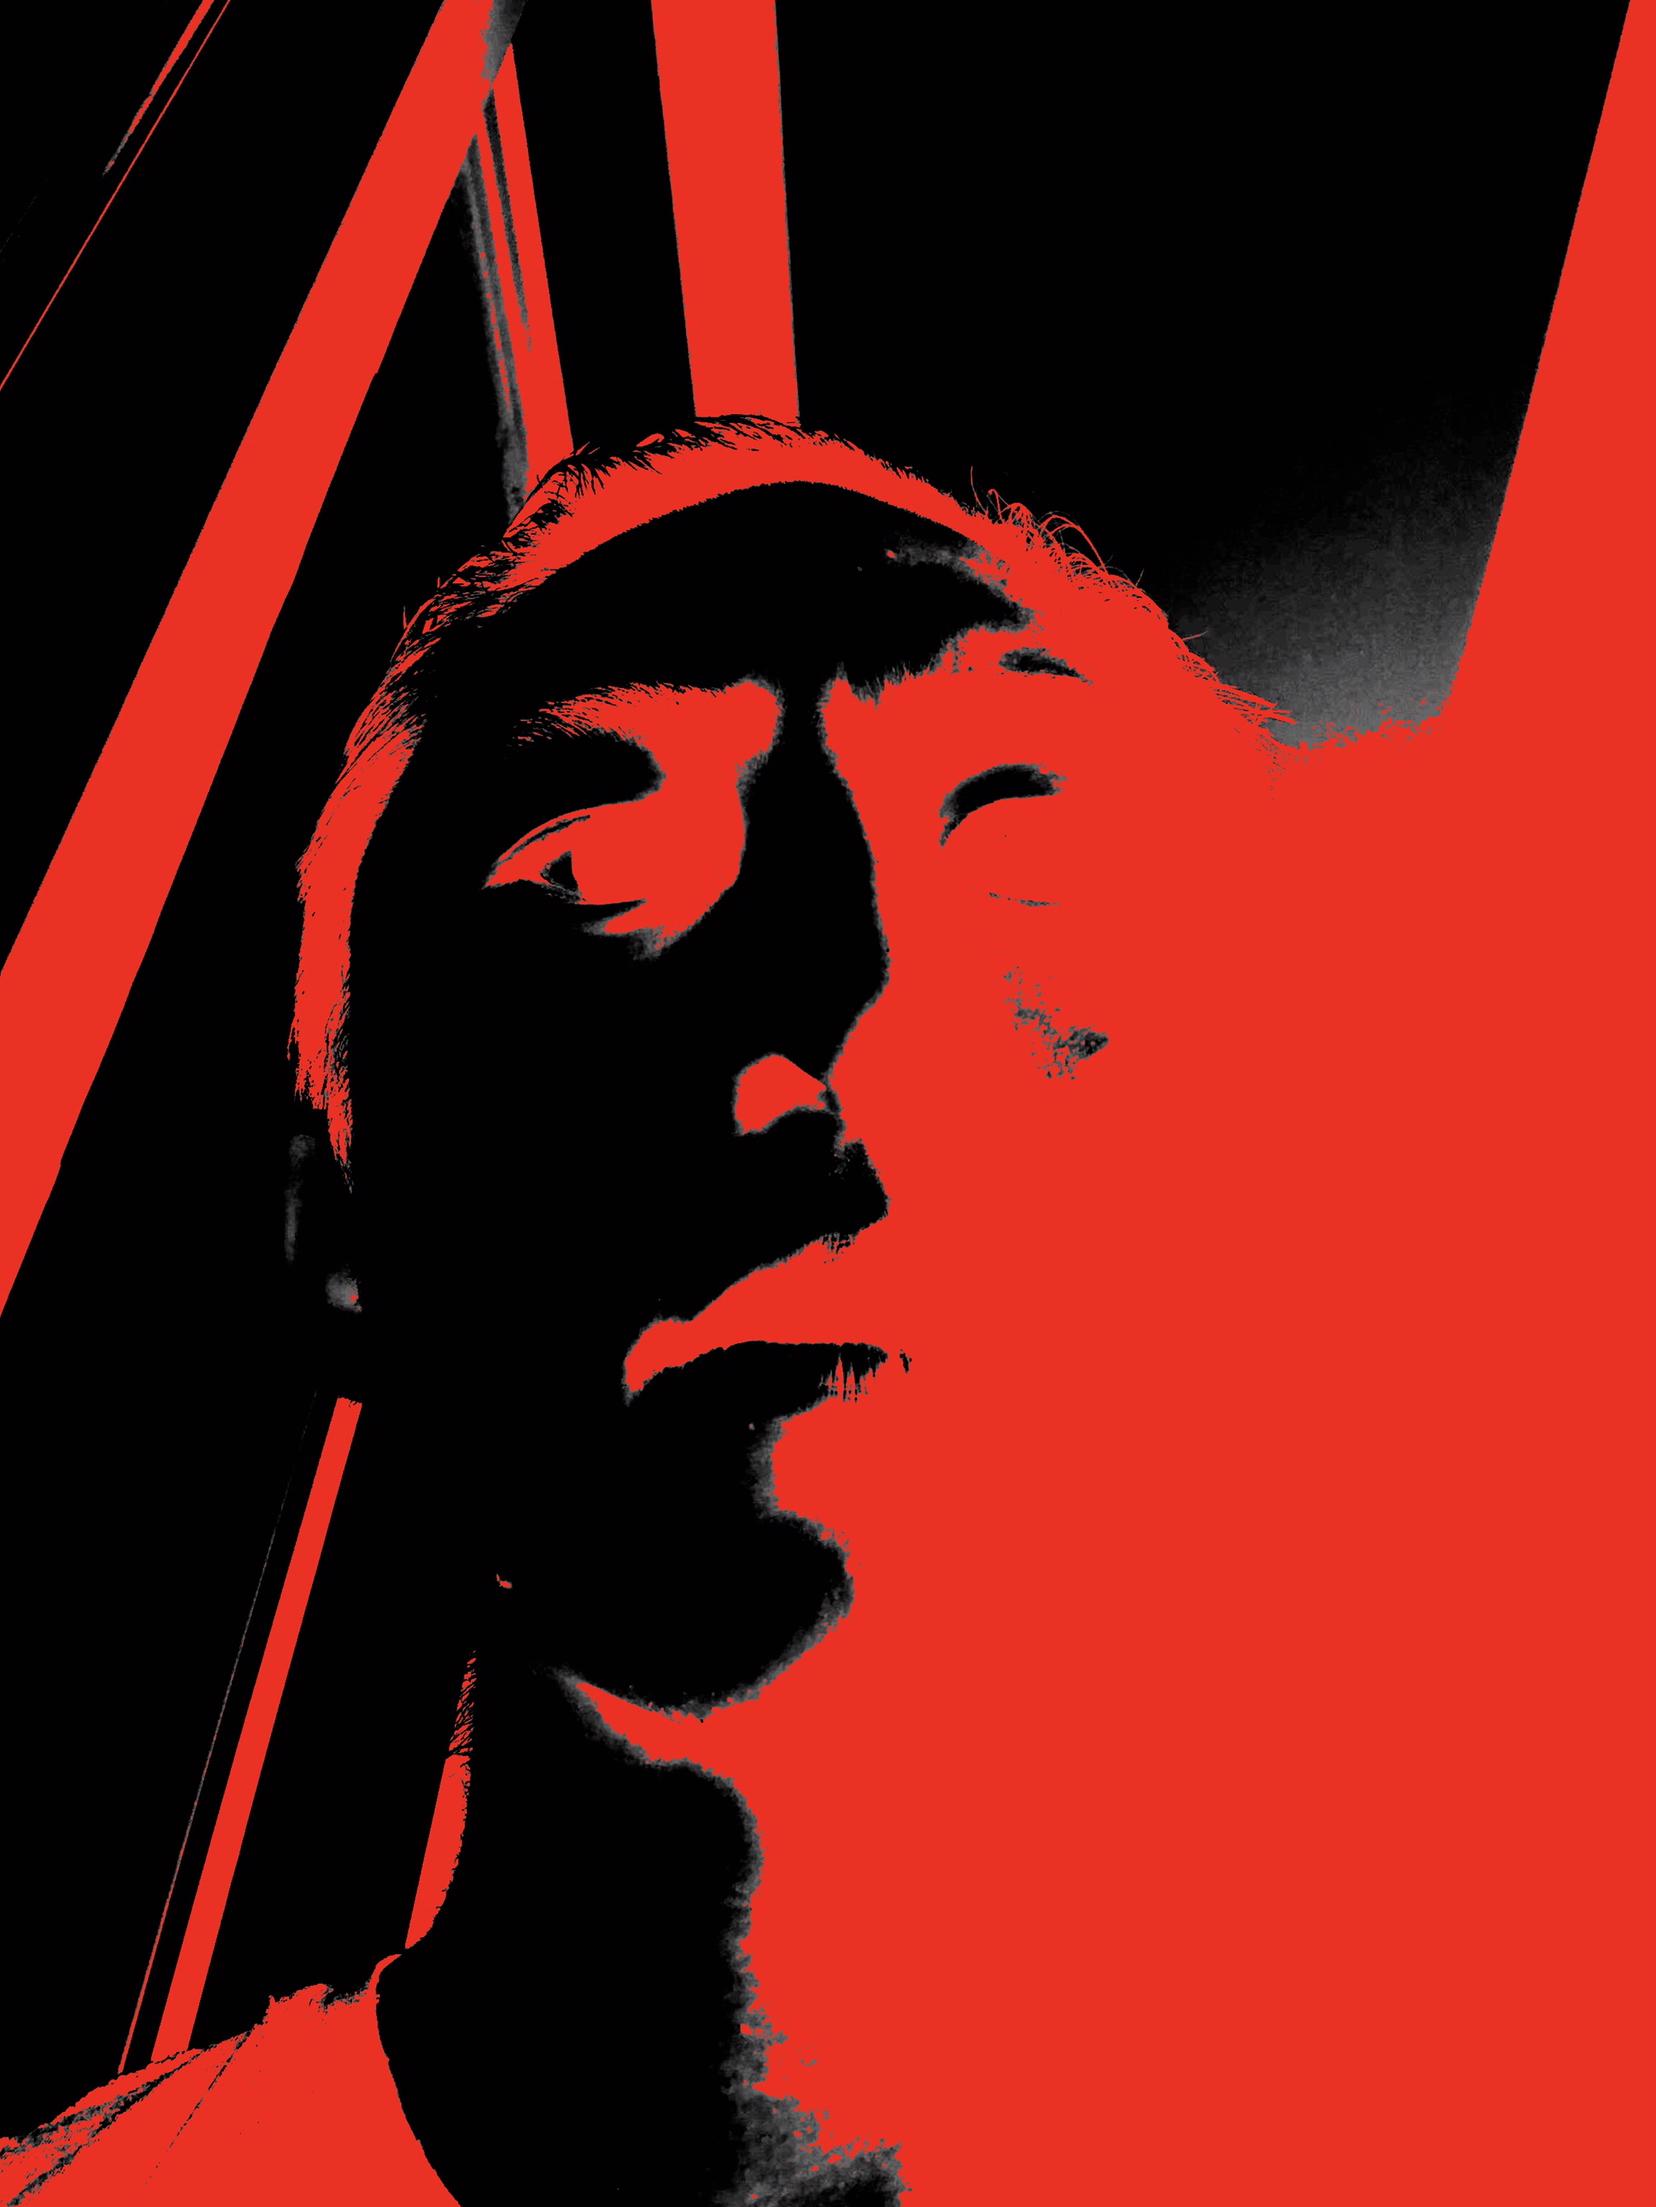 Selfie red ERIC KIM black